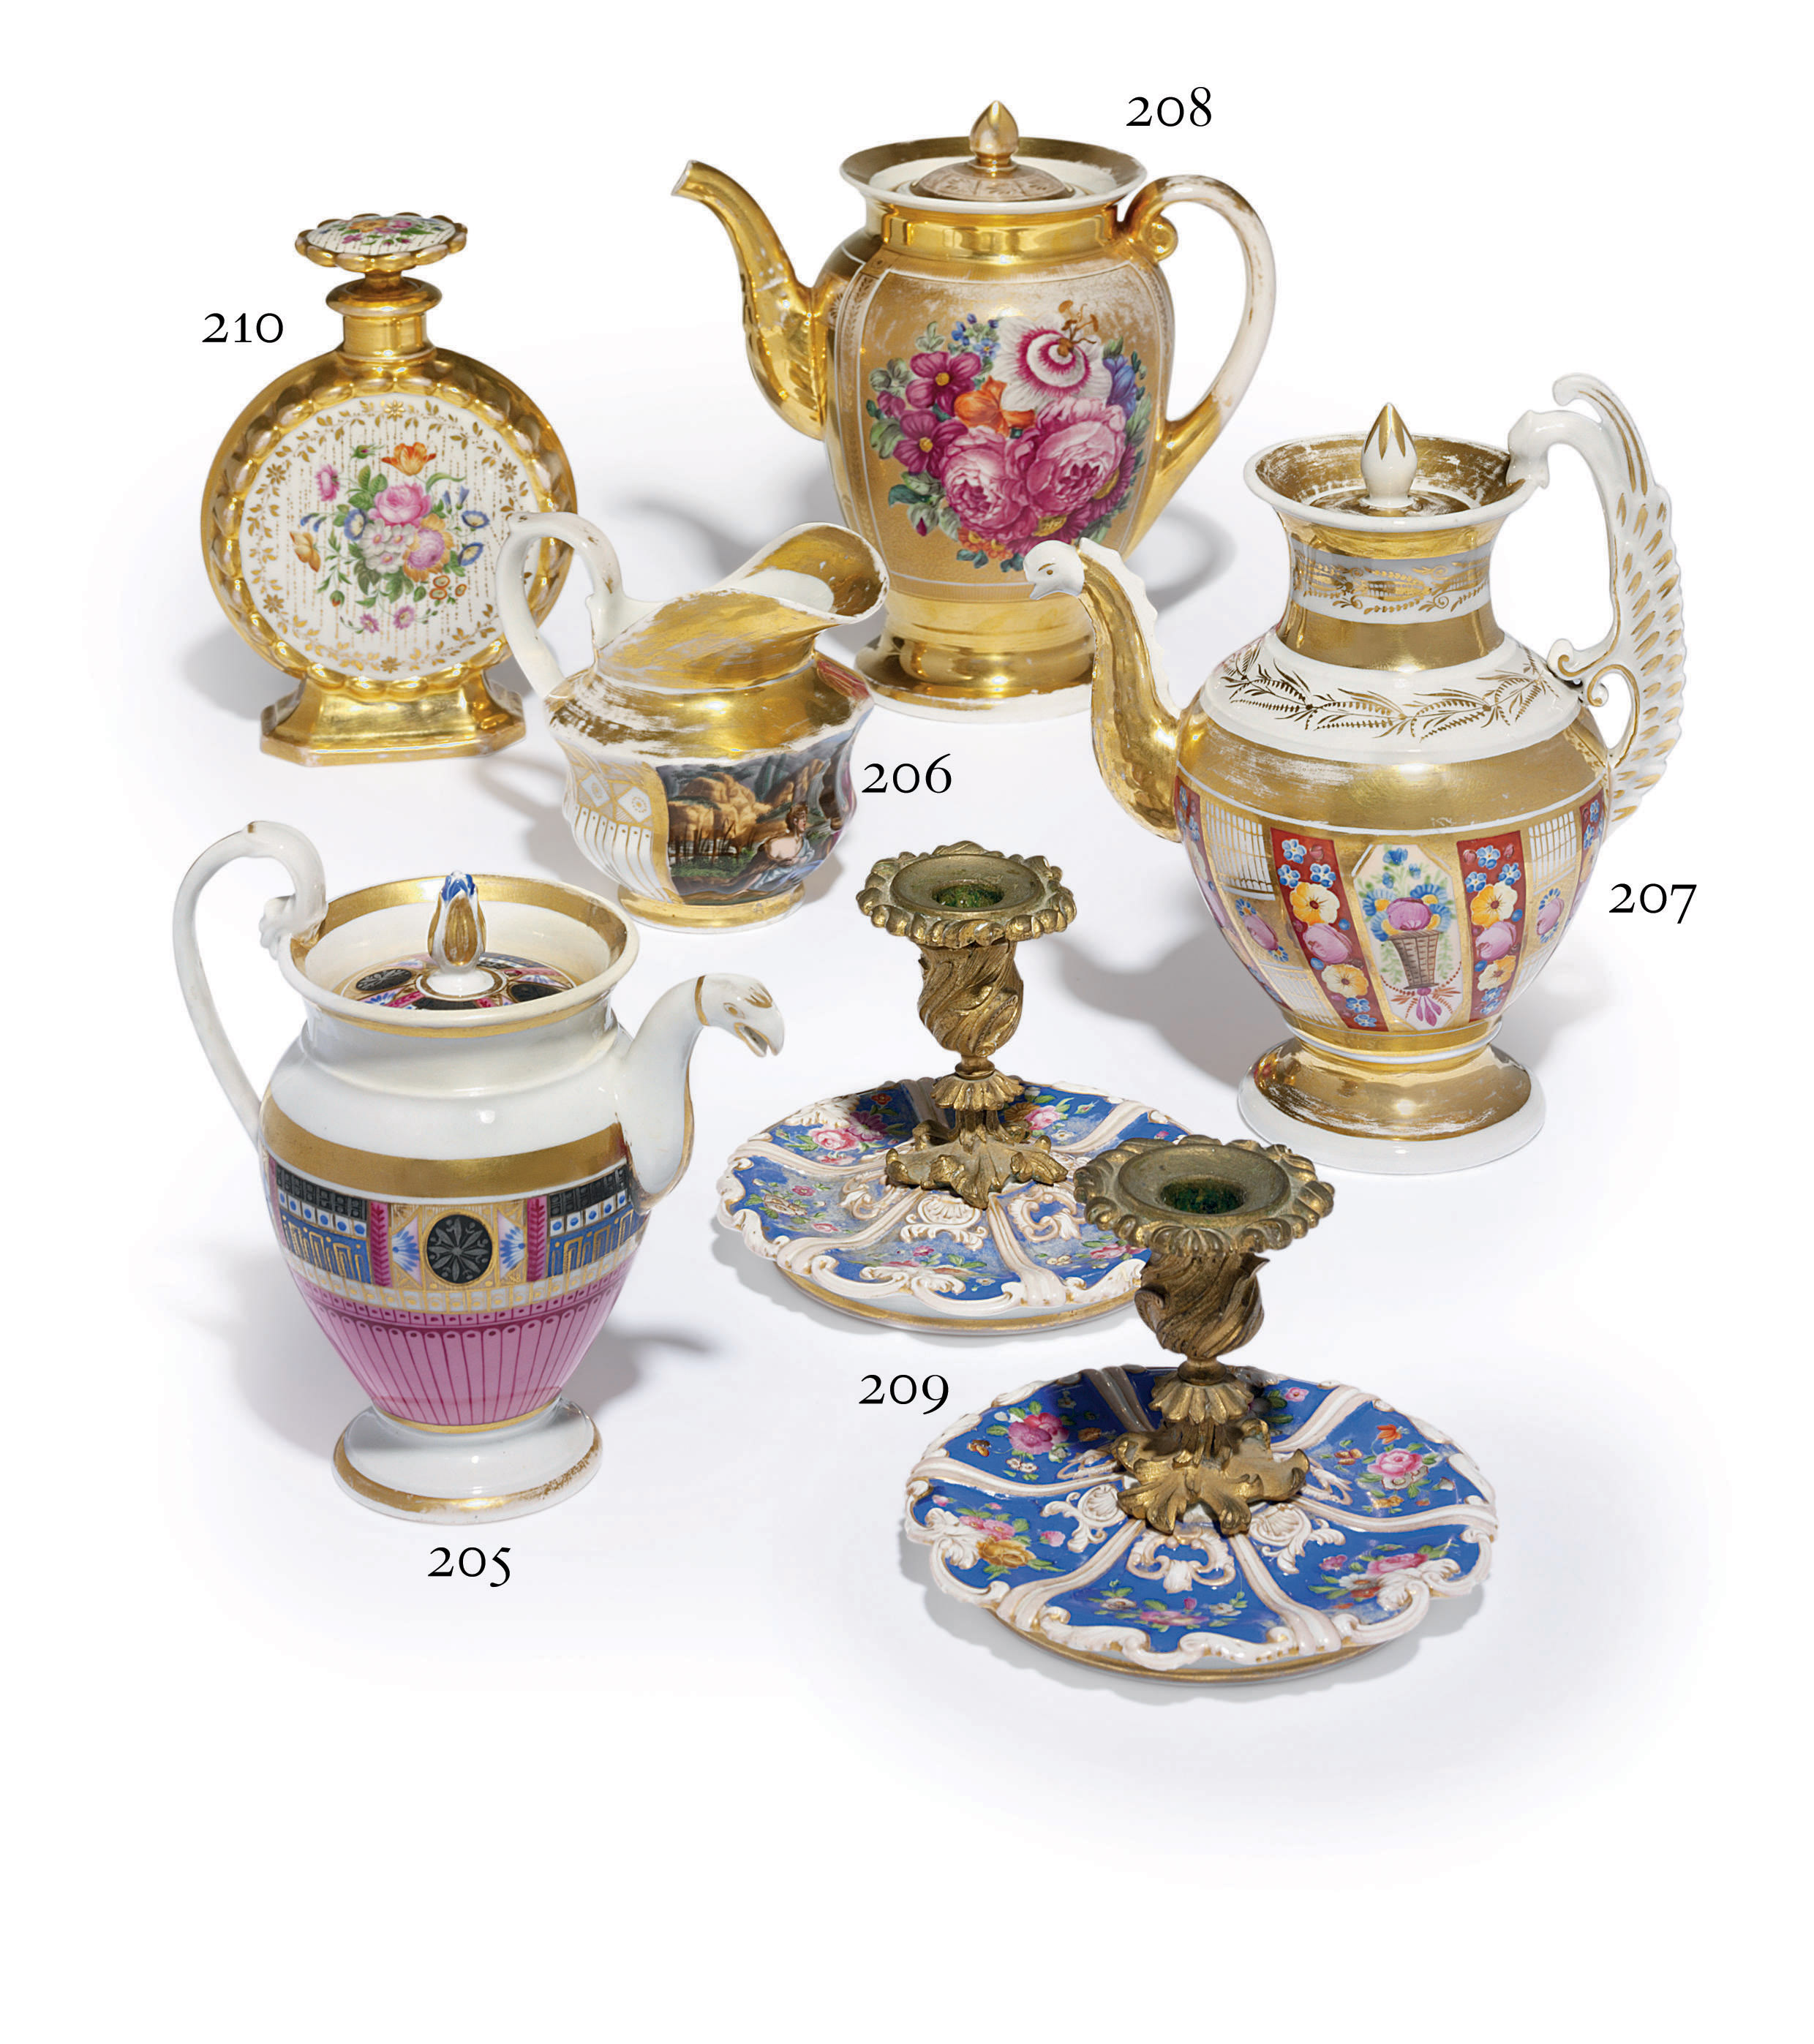 A Rare Porcelain Covered Tea-Pot